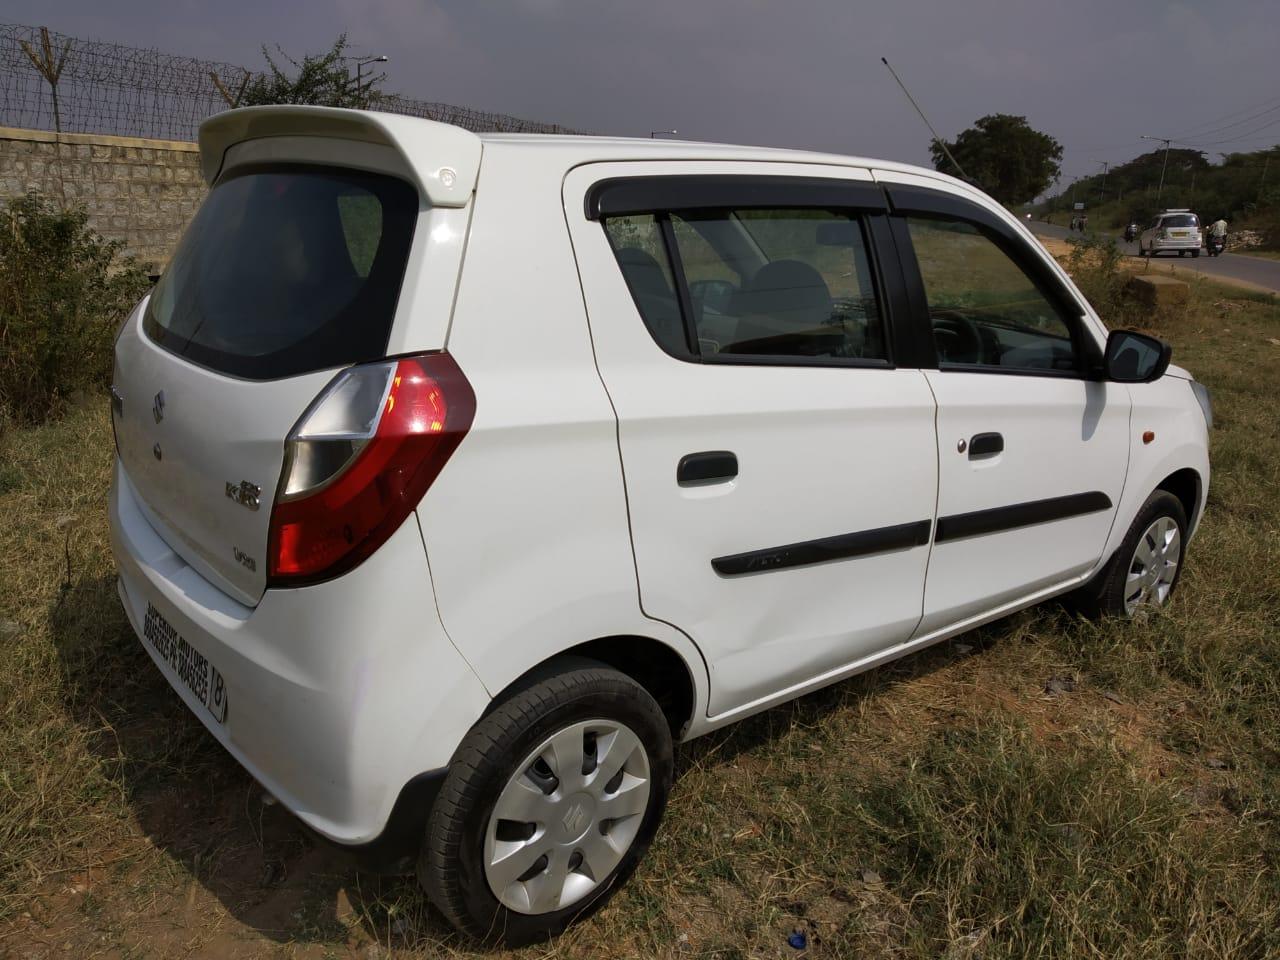 Maruti Suzuki Alto K10 Vxi Mahindra First Choice